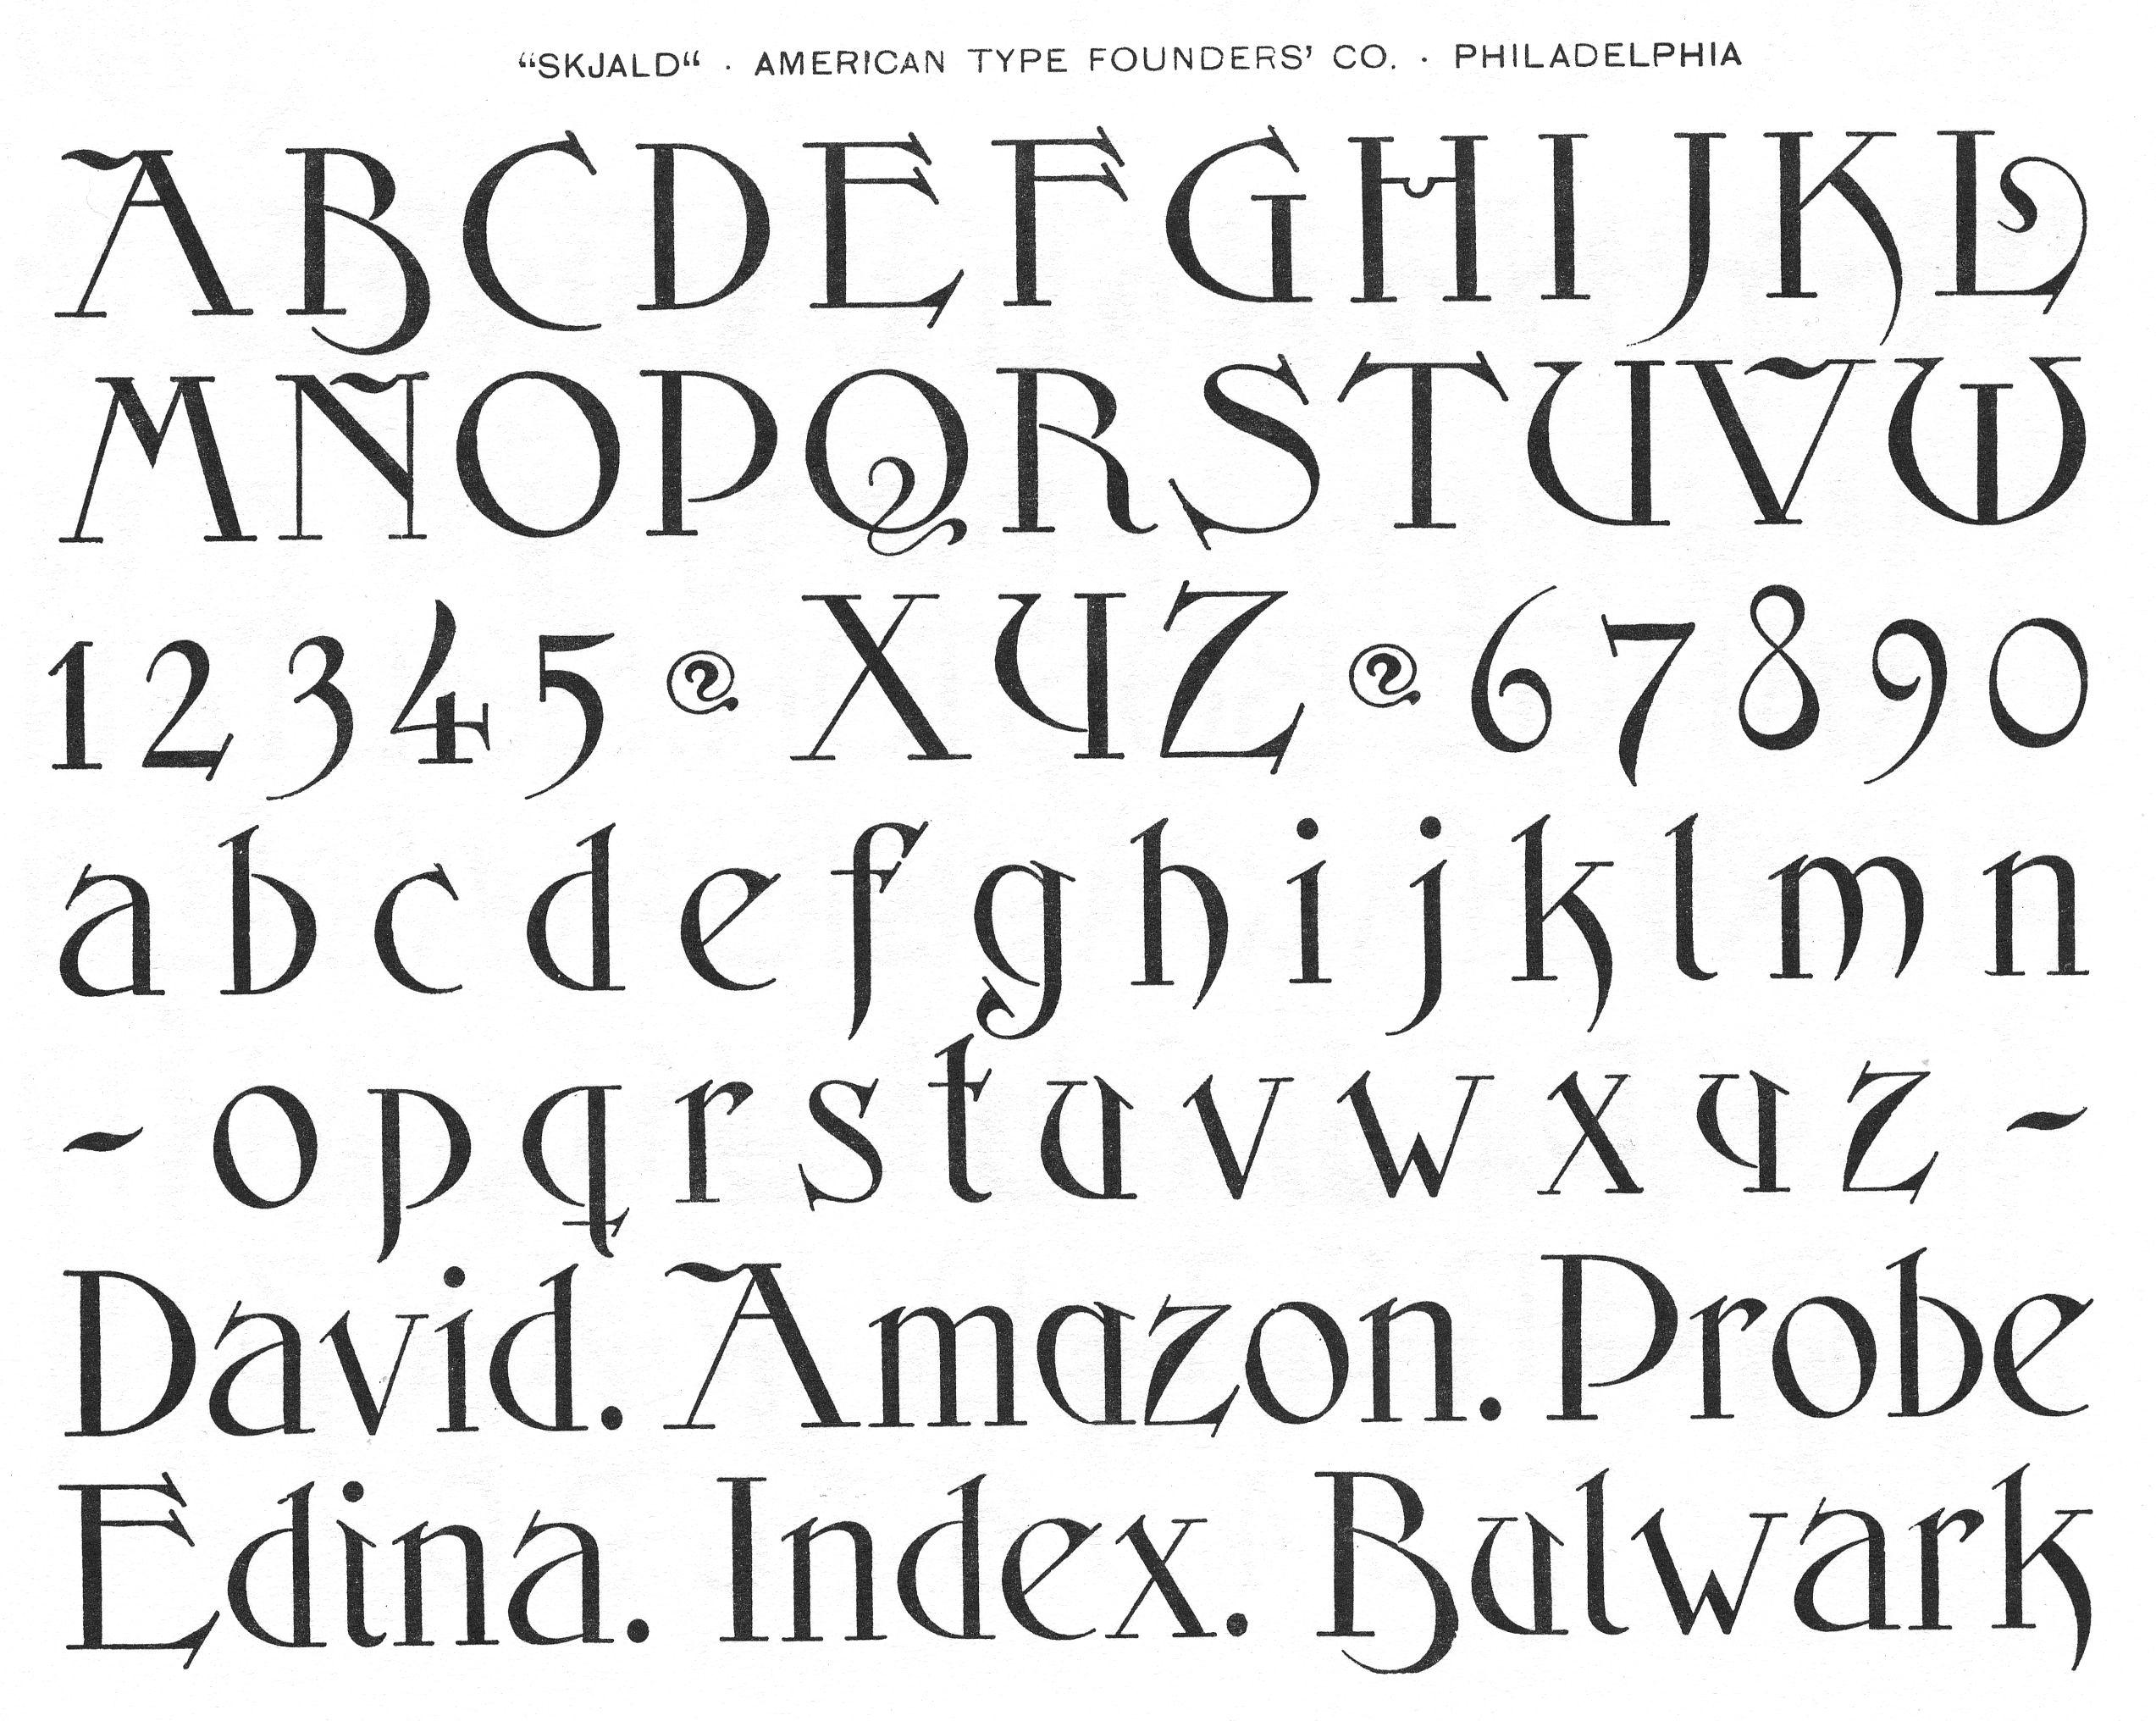 santa claus engraving - Google Search